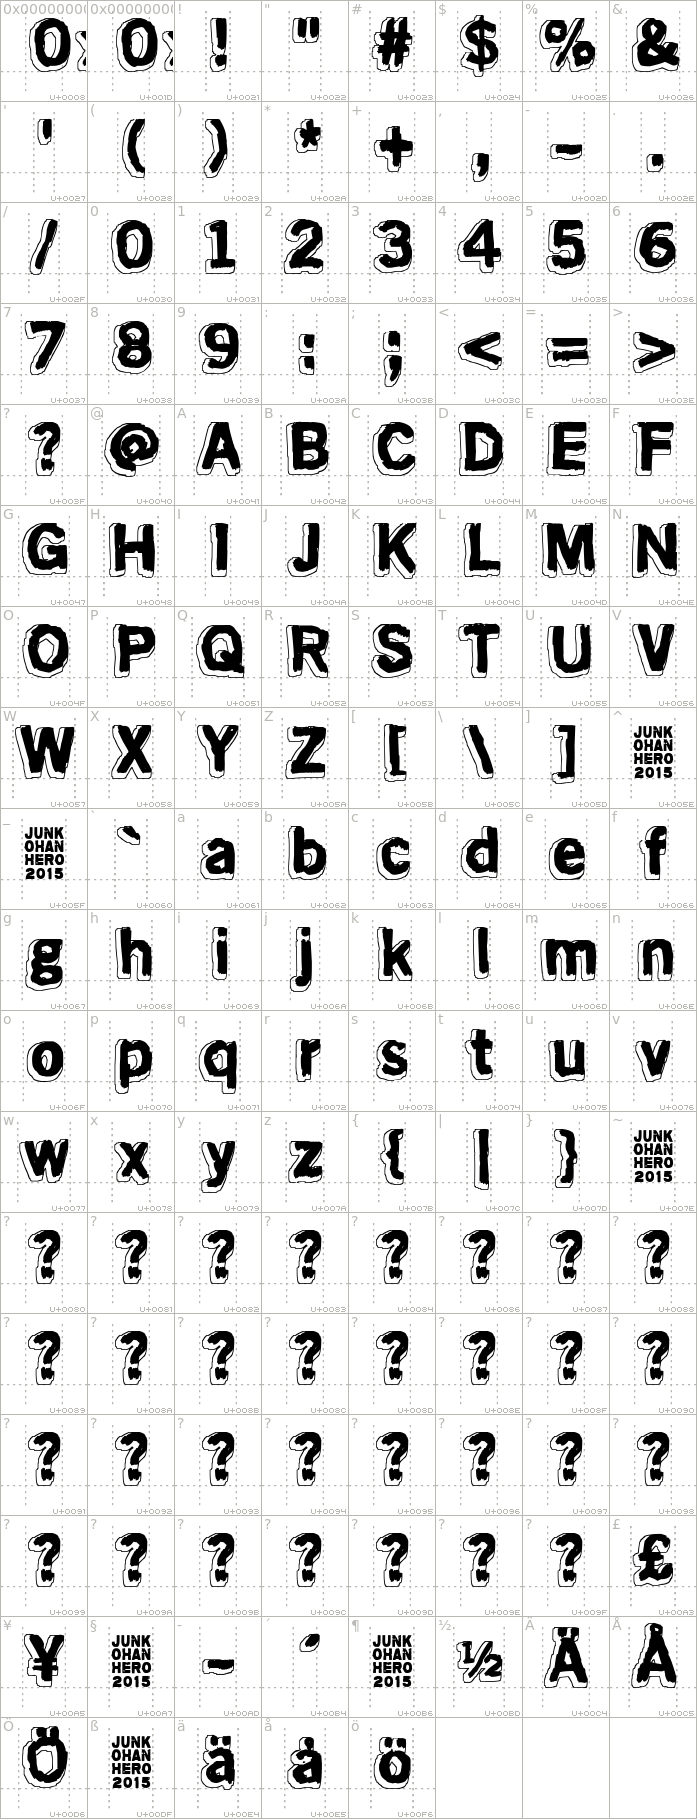 mondo-bongo.regular.character-map-1